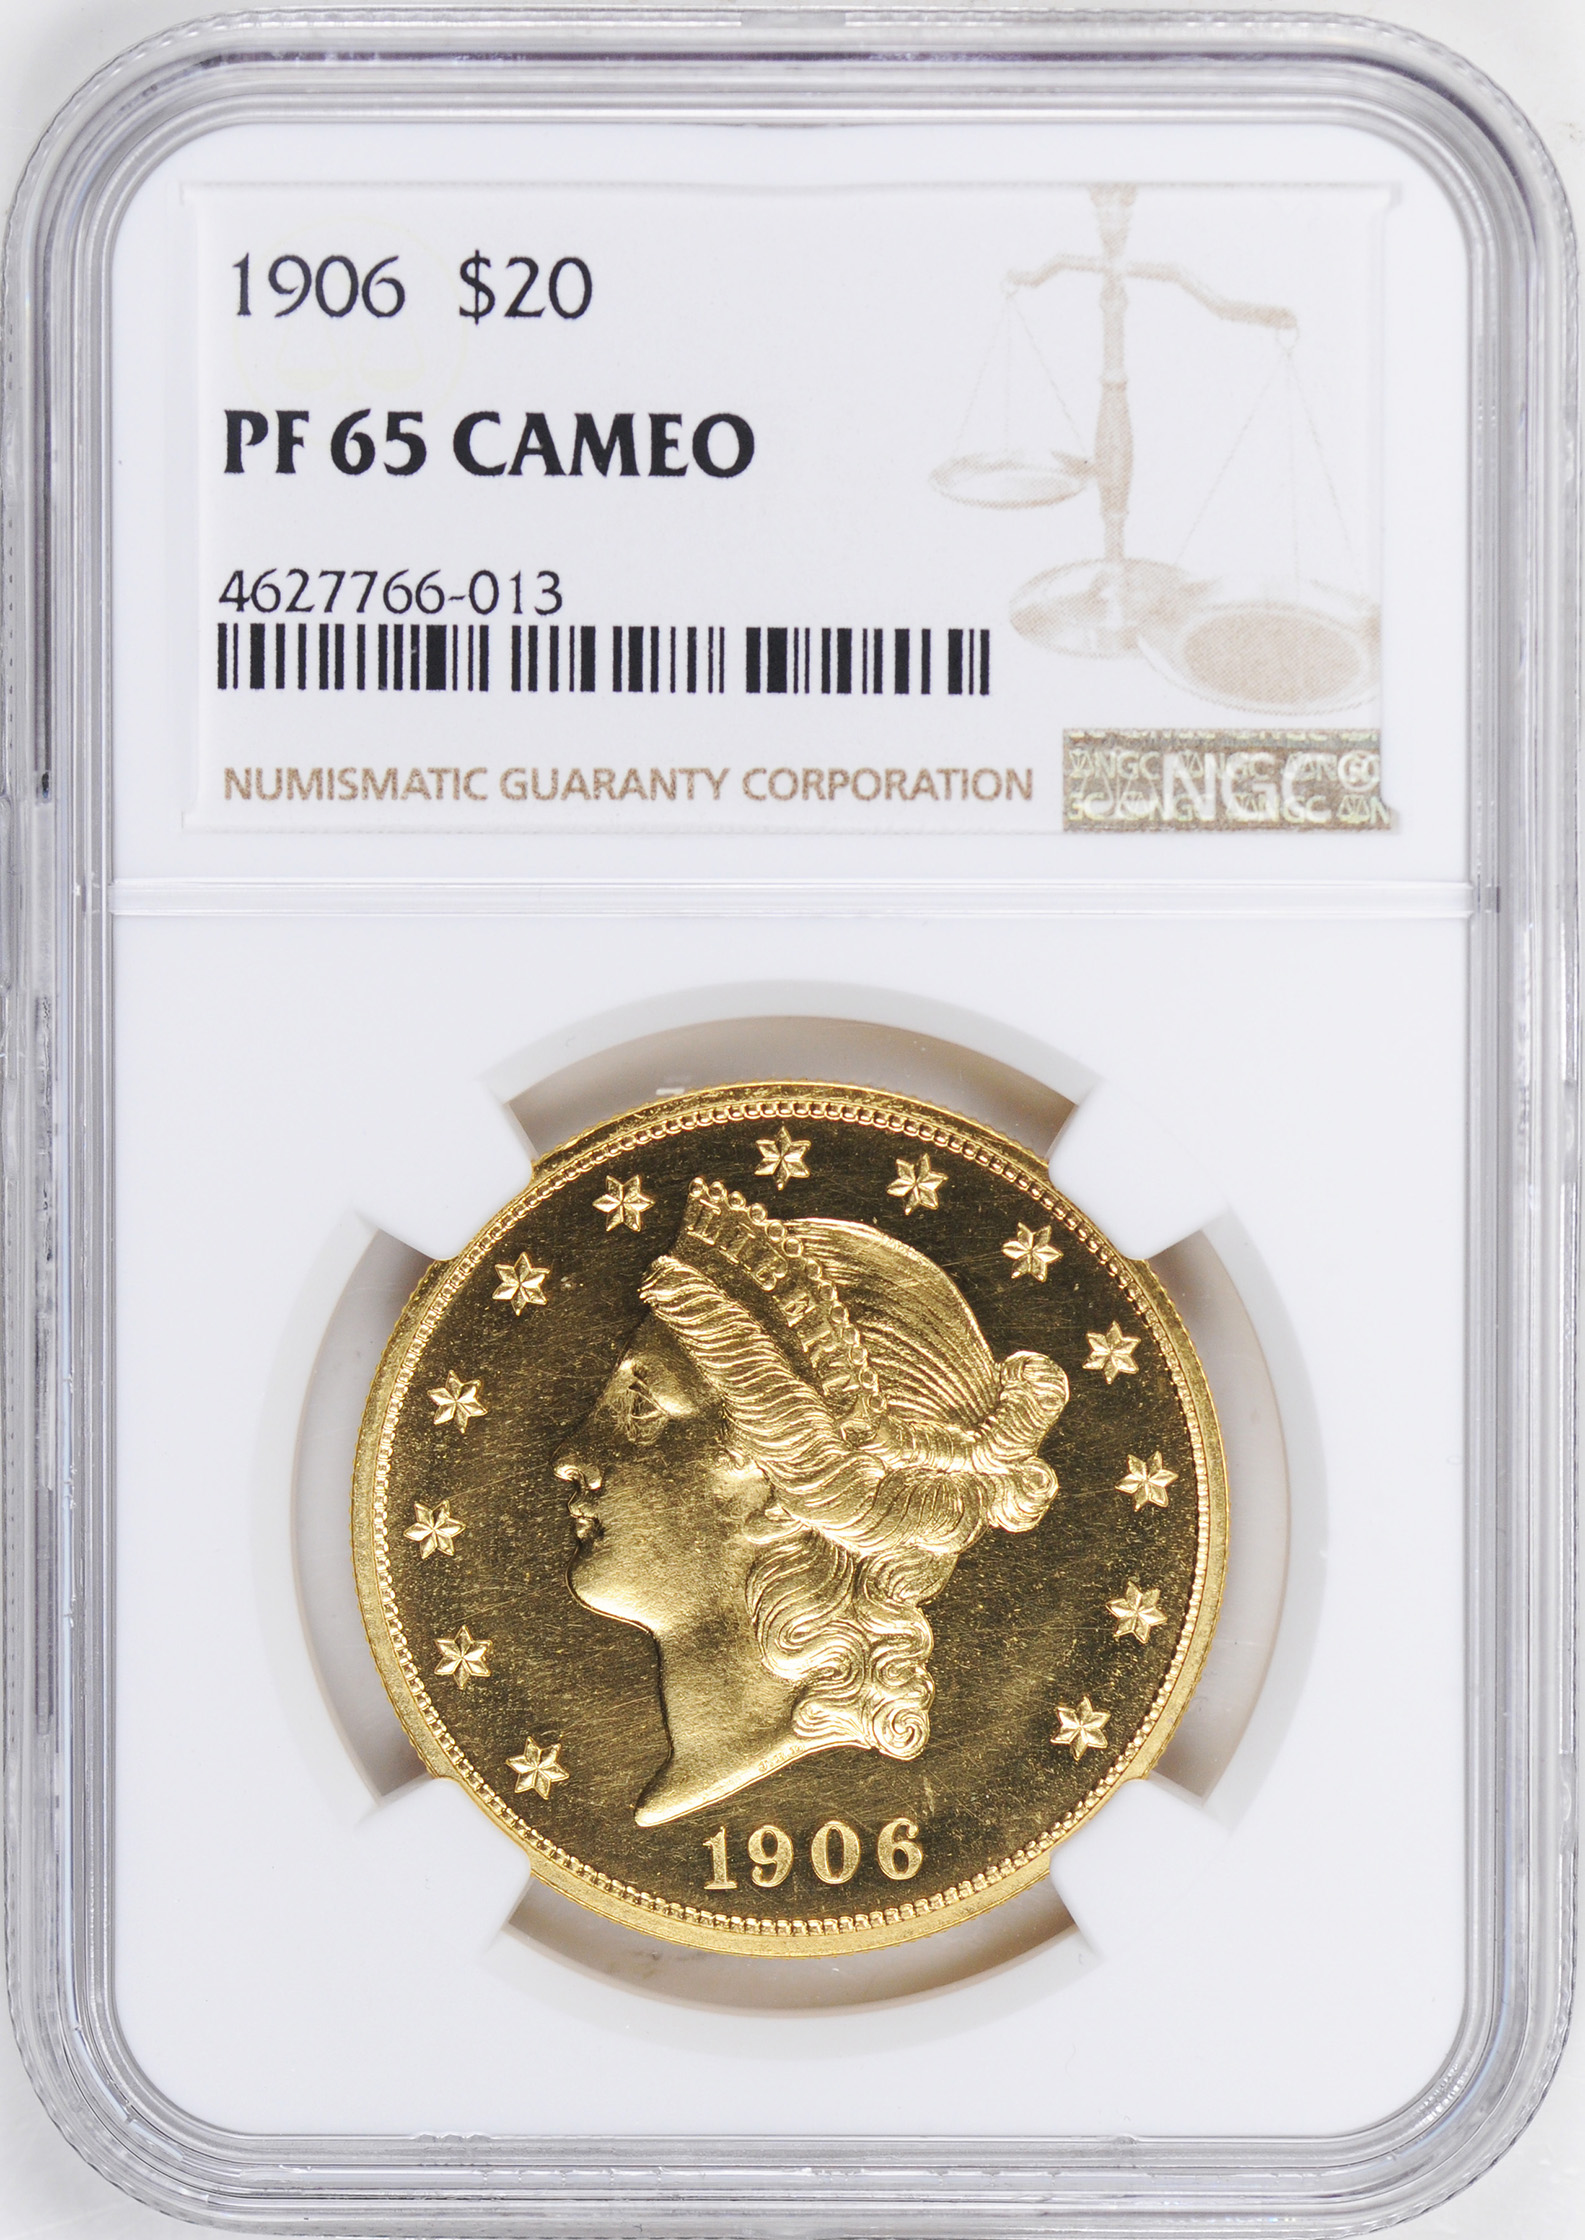 1906 LIBERTY HEAD $20 PR65 Cameo